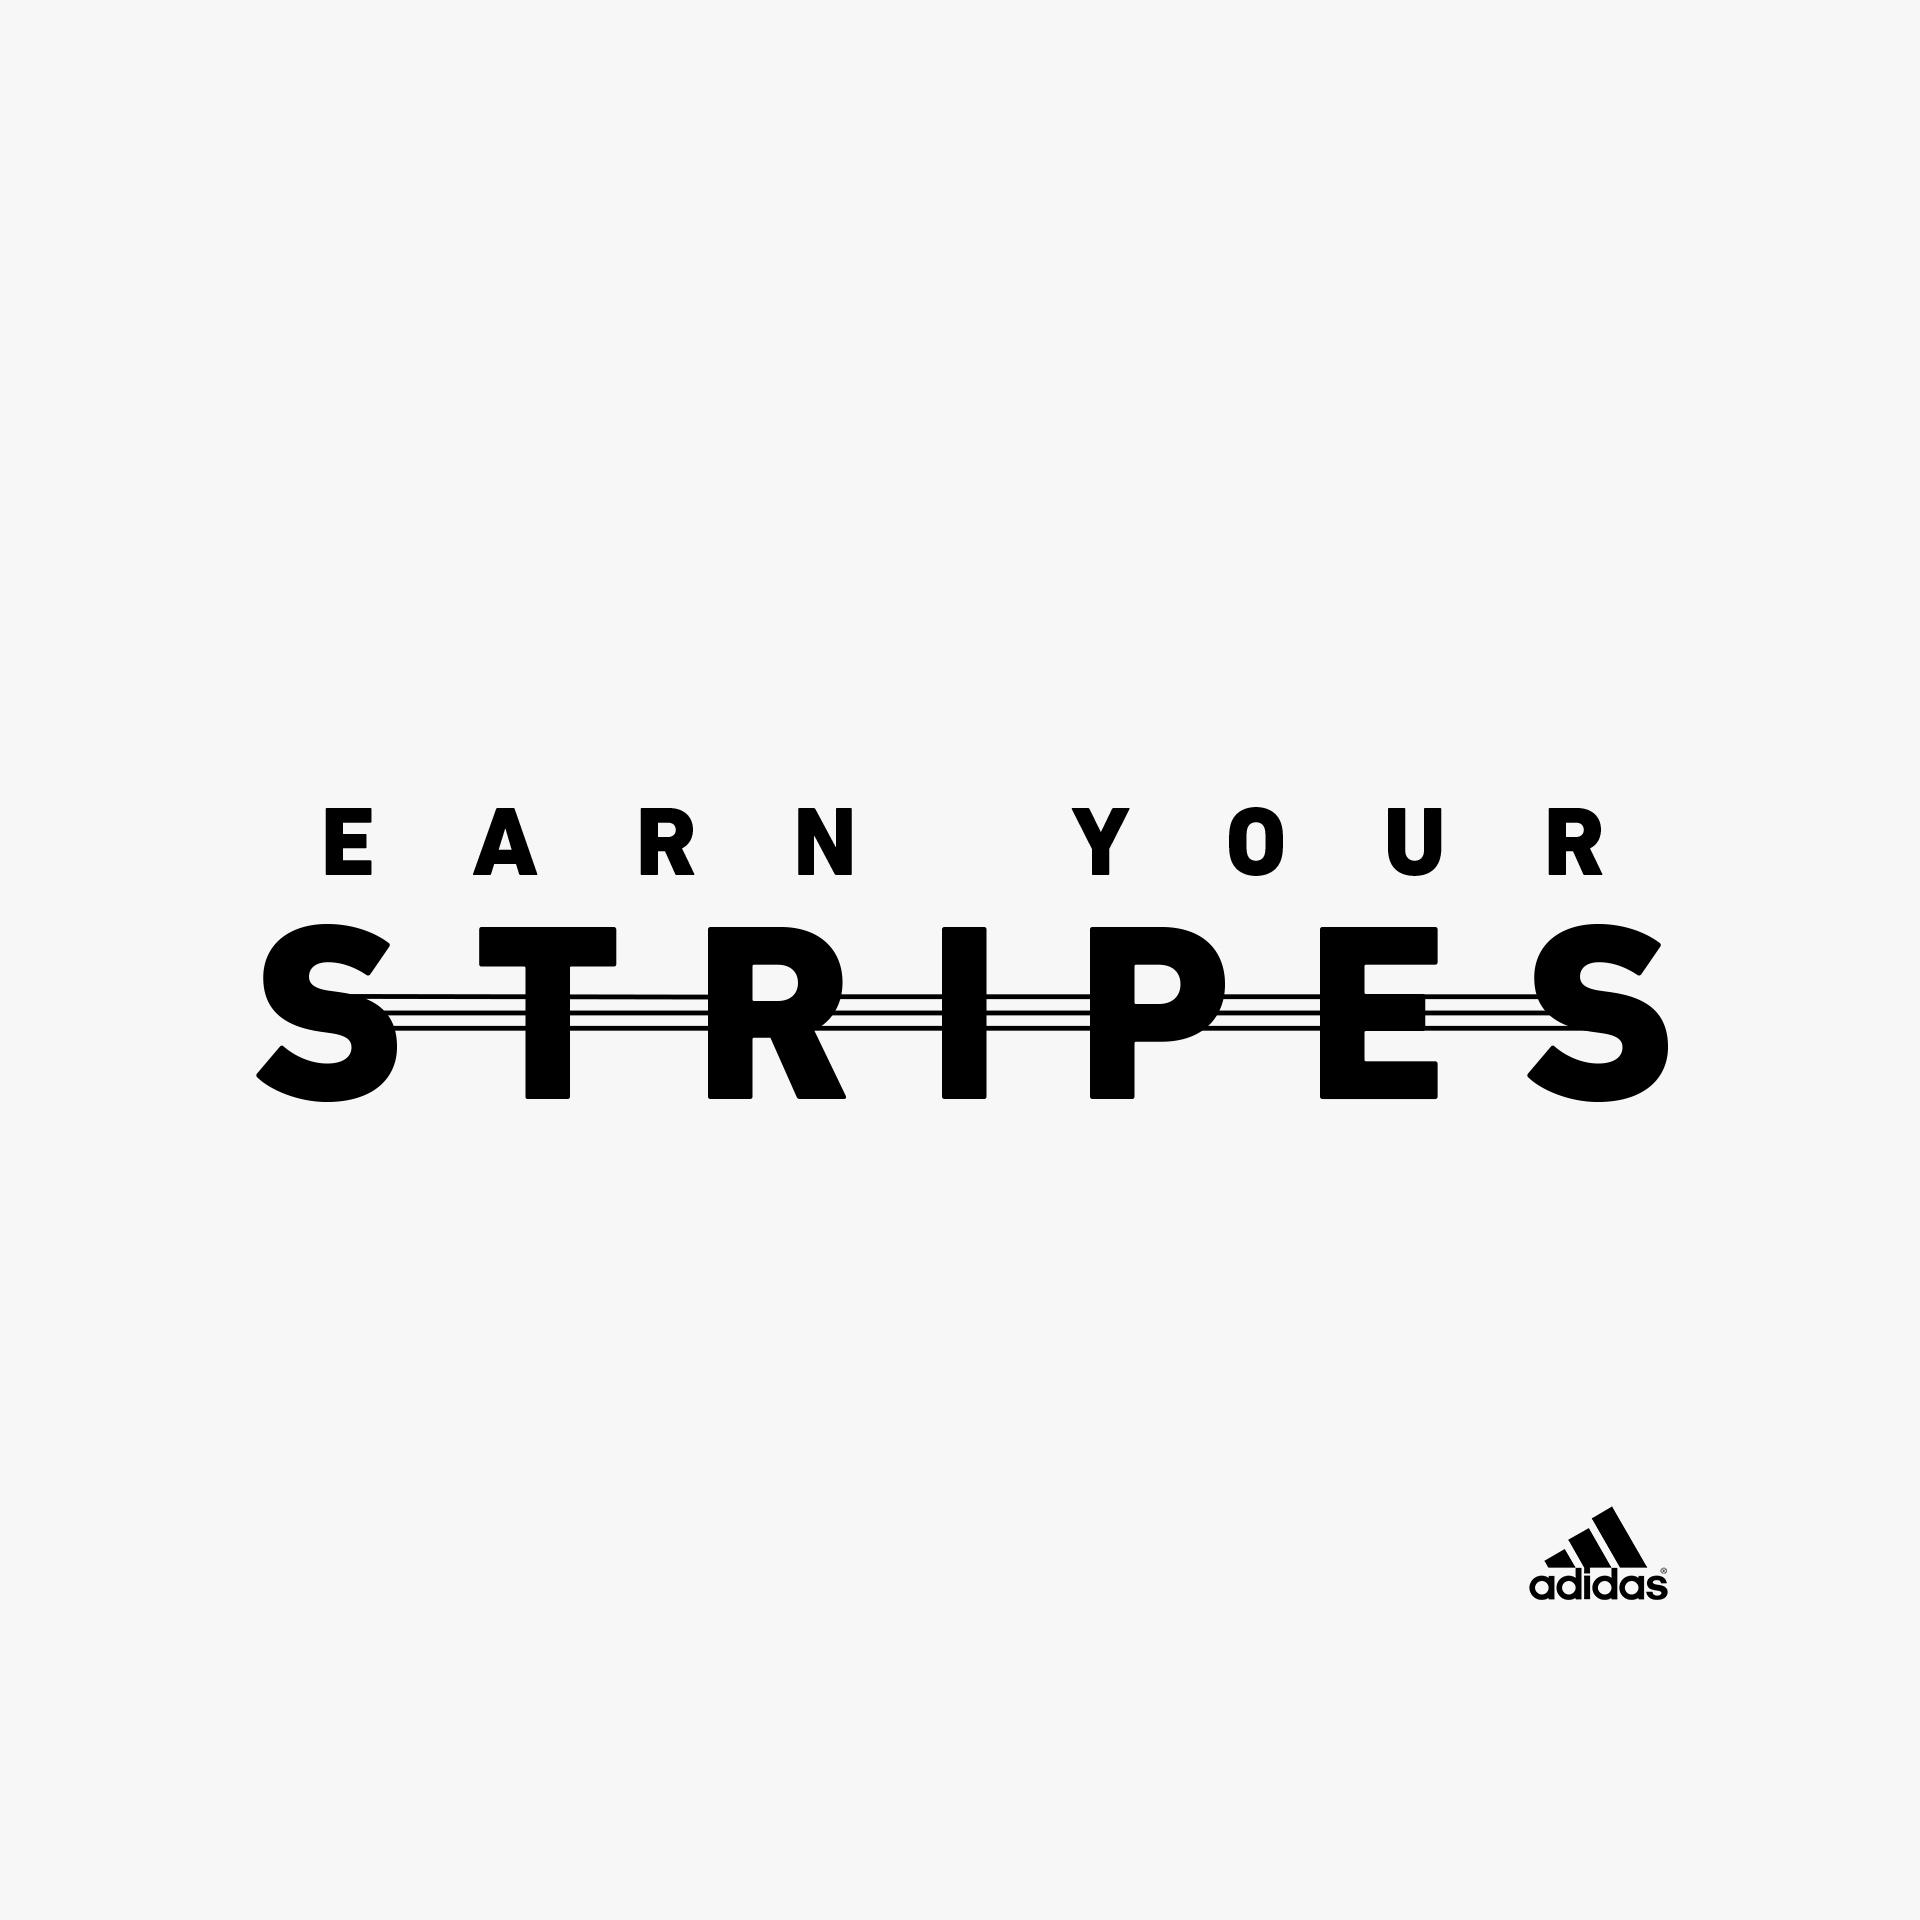 Adidas-image_02